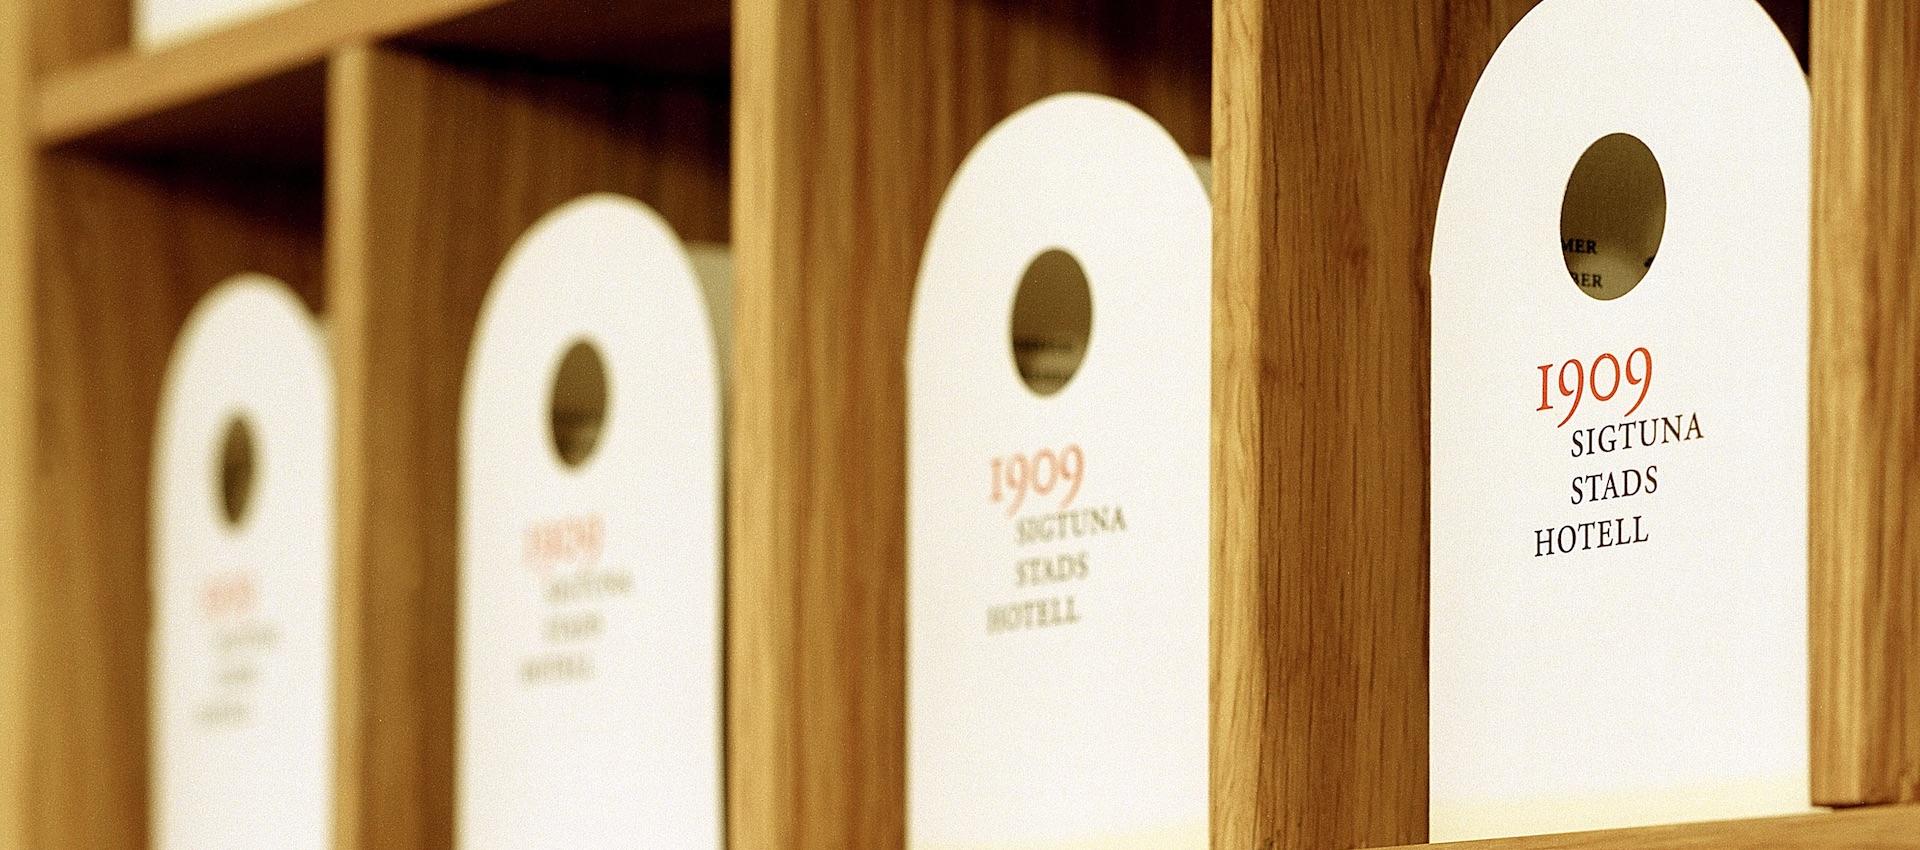 6751 AJ8 11-2001 Sigtuna Stadshotell